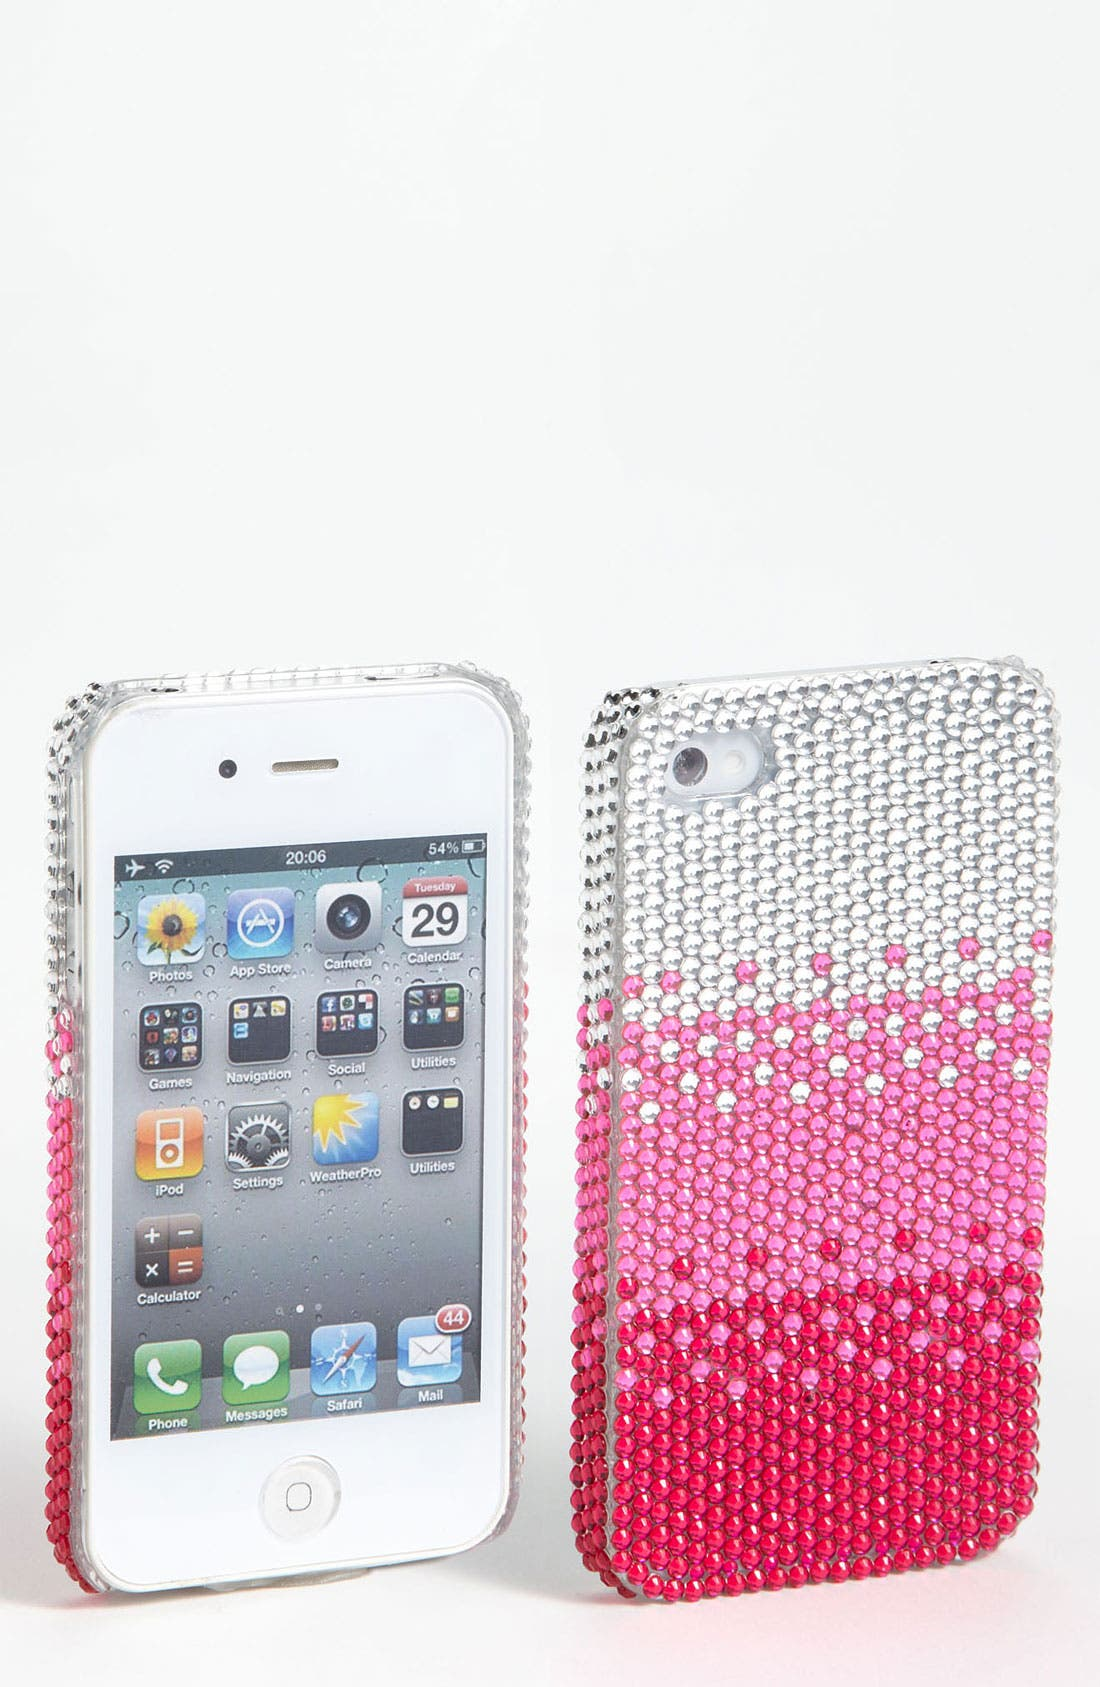 Main Image - Tricoastal Design iPhone 4 & 4s Ombré Rhinestone Case